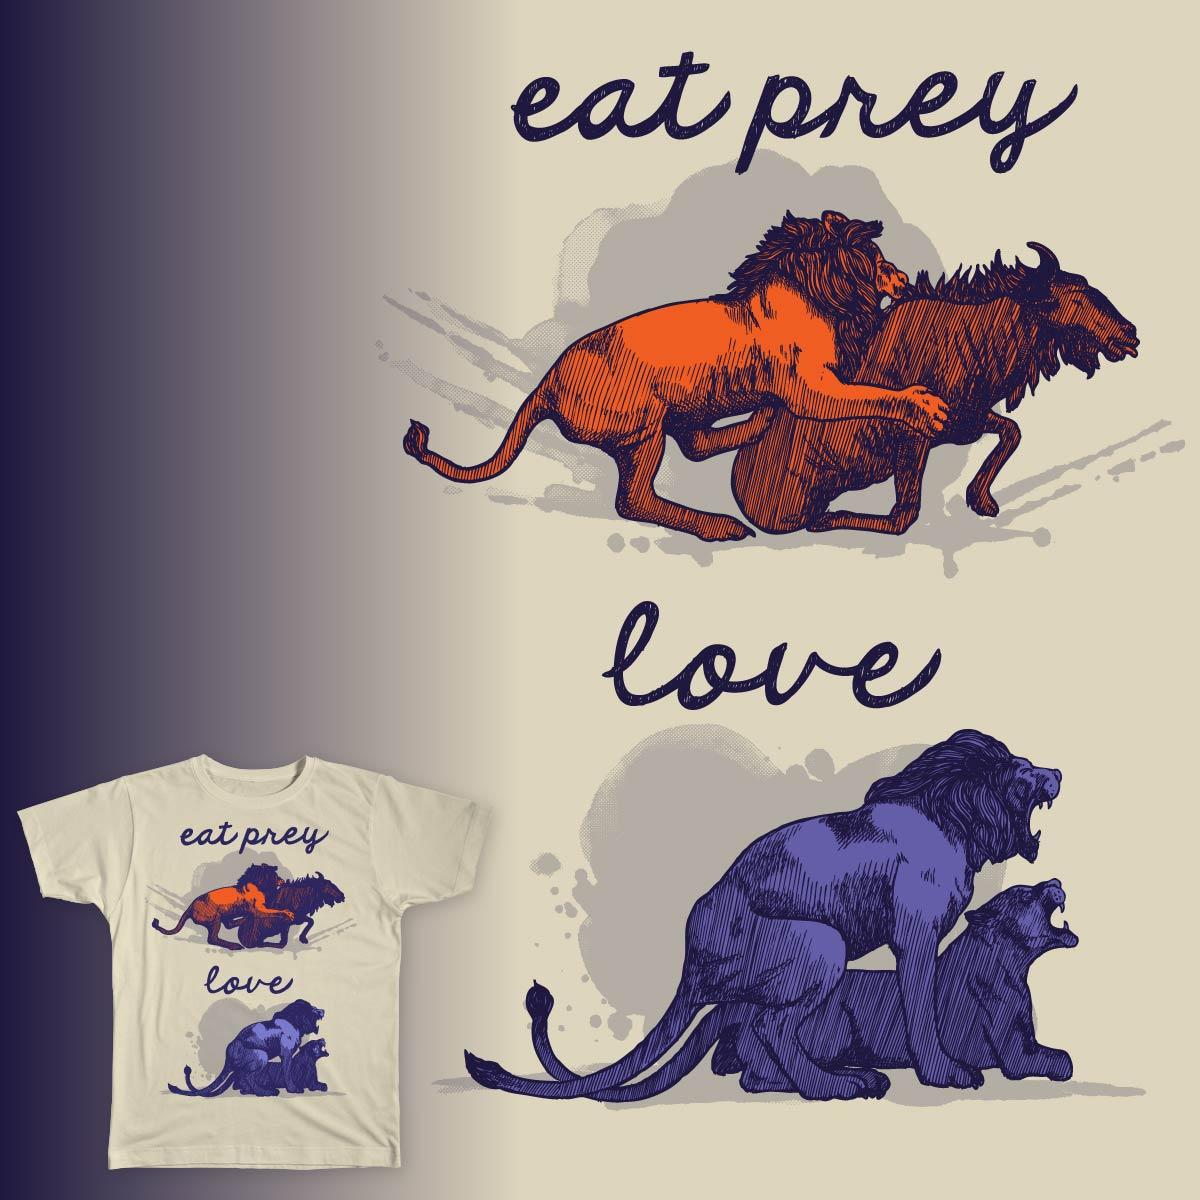 Eat Prey, Love by Vatolobo on Threadless